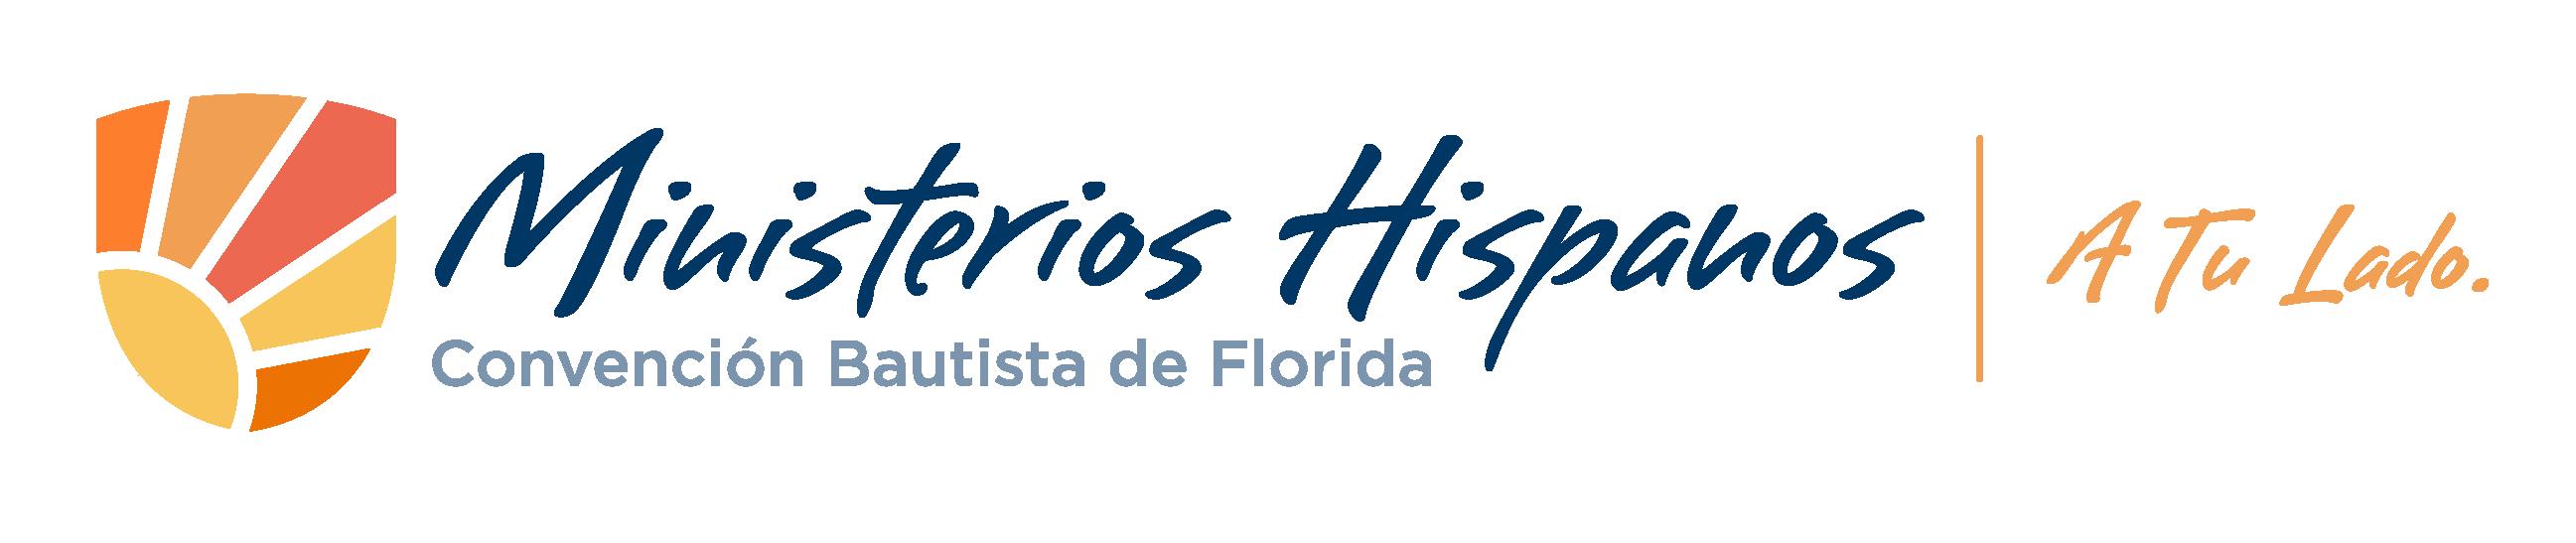 Florida Baptist Convention, Mnisterios Hispanos